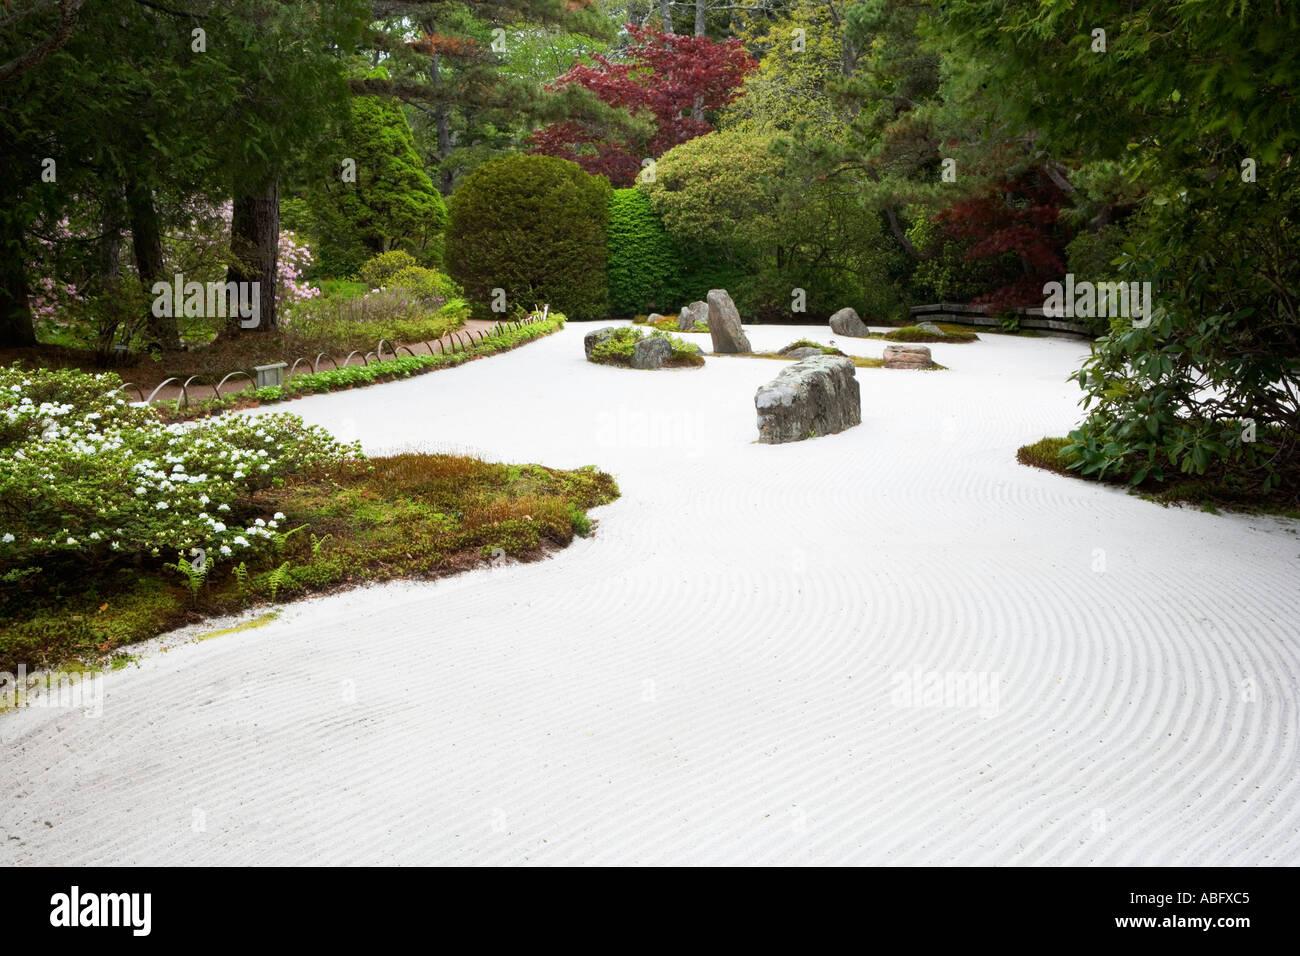 Zen Garten Werkzeug Bonsai Baumschule Gartengestaltung Gartenbau